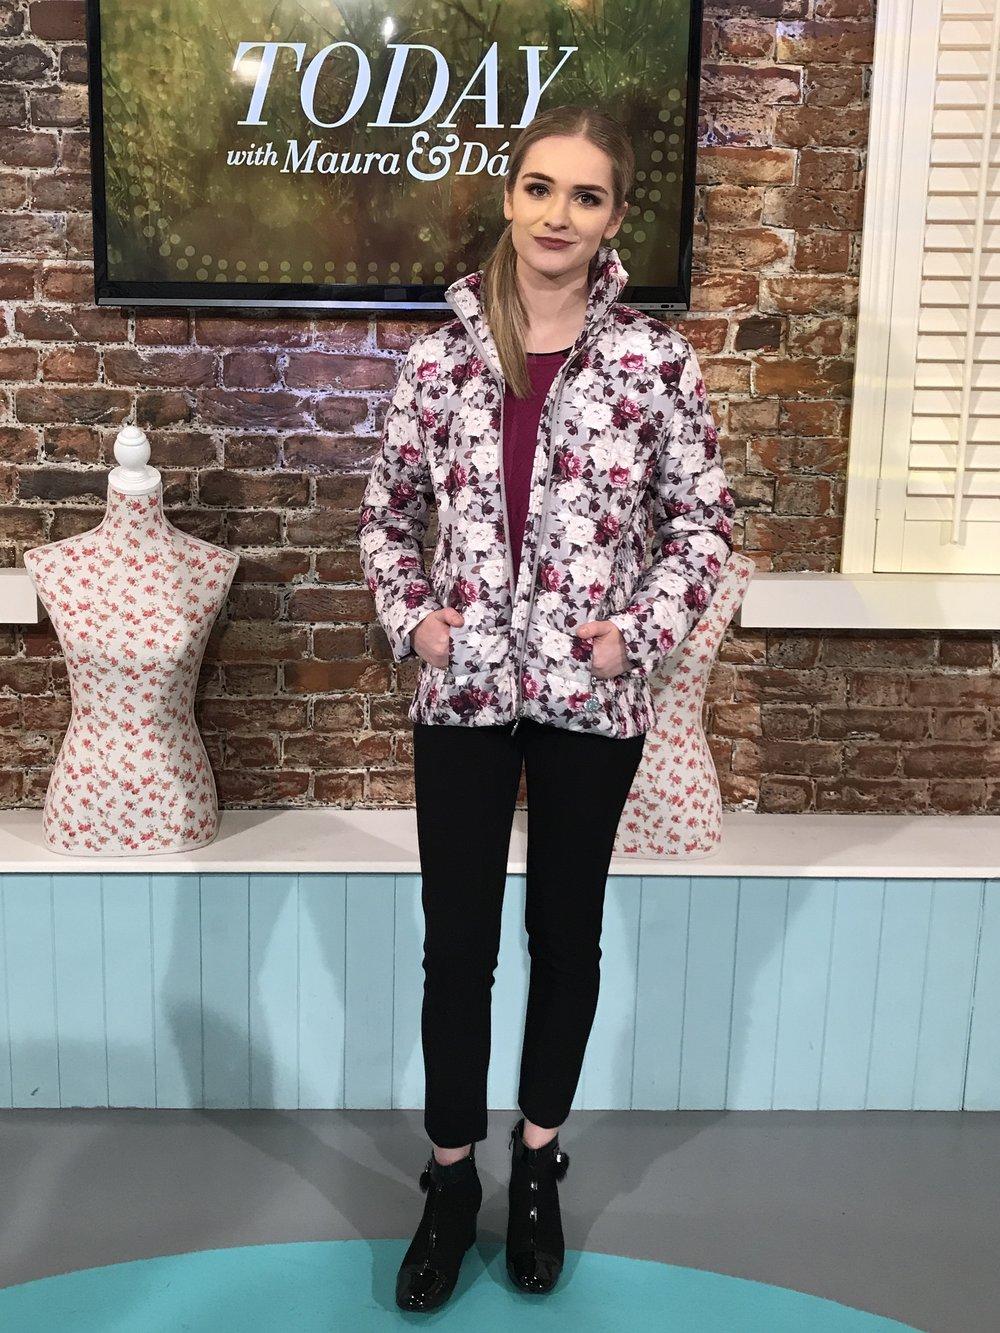 Blossom Printed Jacket : €65.  Sizes S-XL   Argyle Detail Sweater : €22.  Sizes S-XL. Other Colours: Cherry & Blue   Zip Pocket Trouser : €24.95.  Sizes 8-18